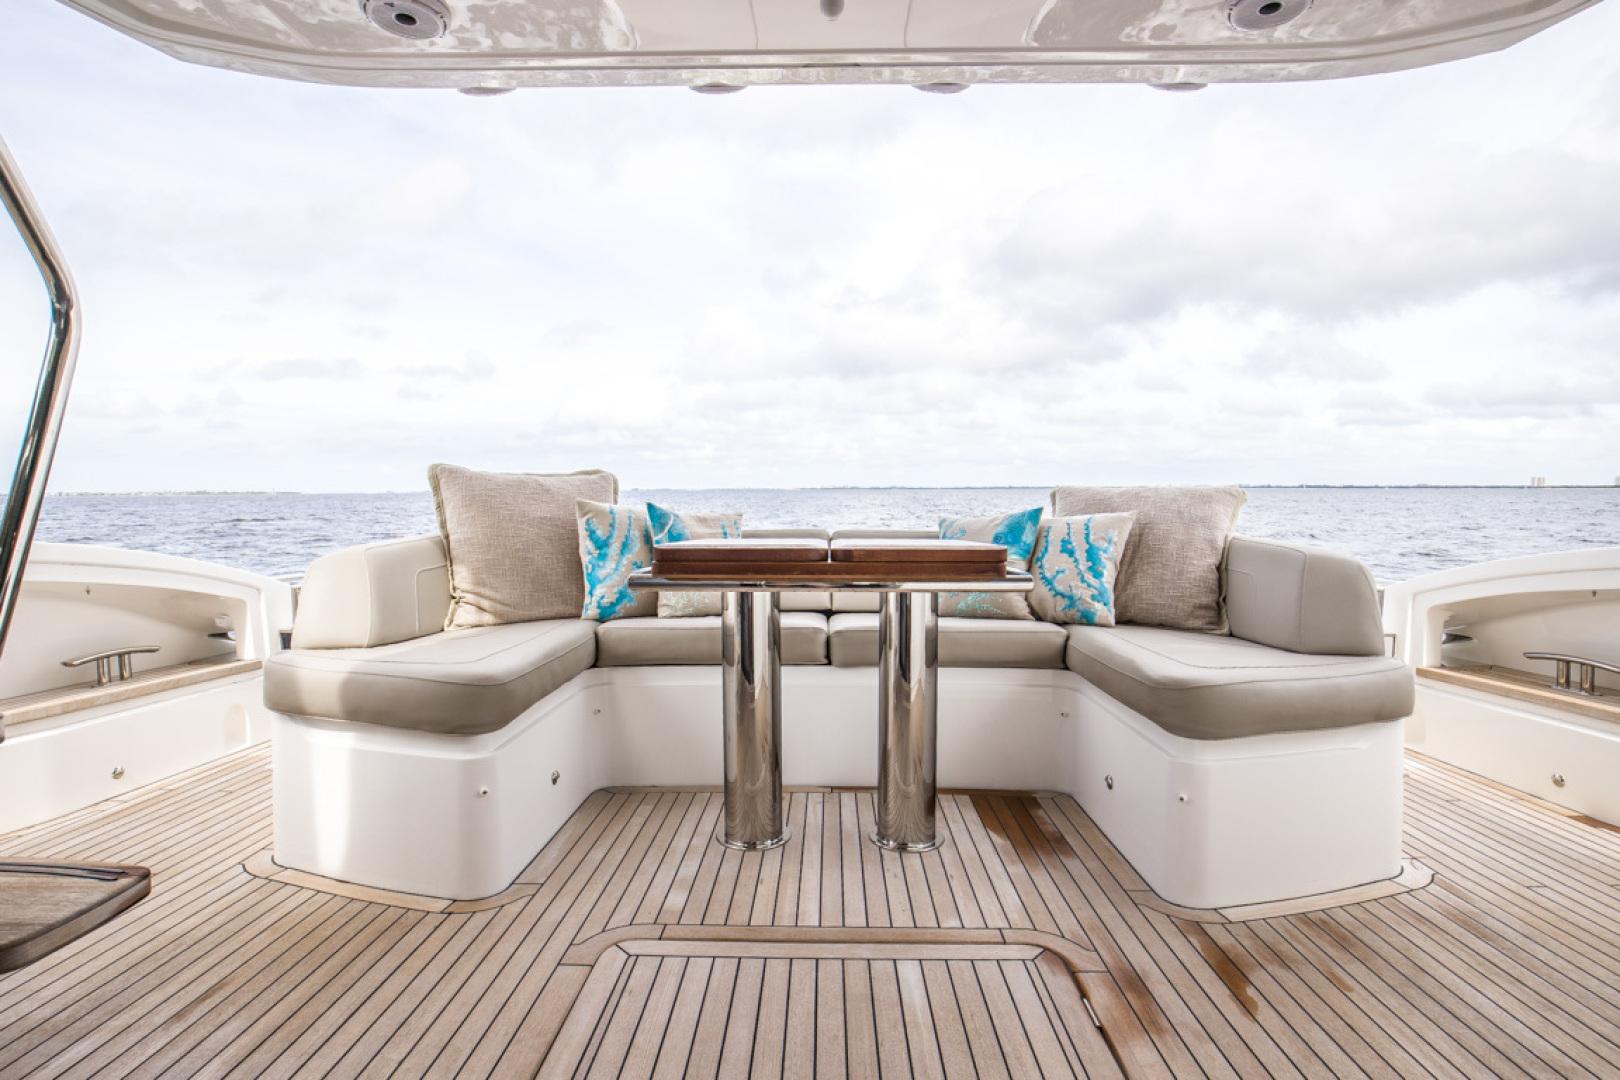 Princess-S65 2019-Paragon Cape Coral-Florida-United States-2019 65 Princess S65-Paragon-Cockpit-1510256 | Thumbnail